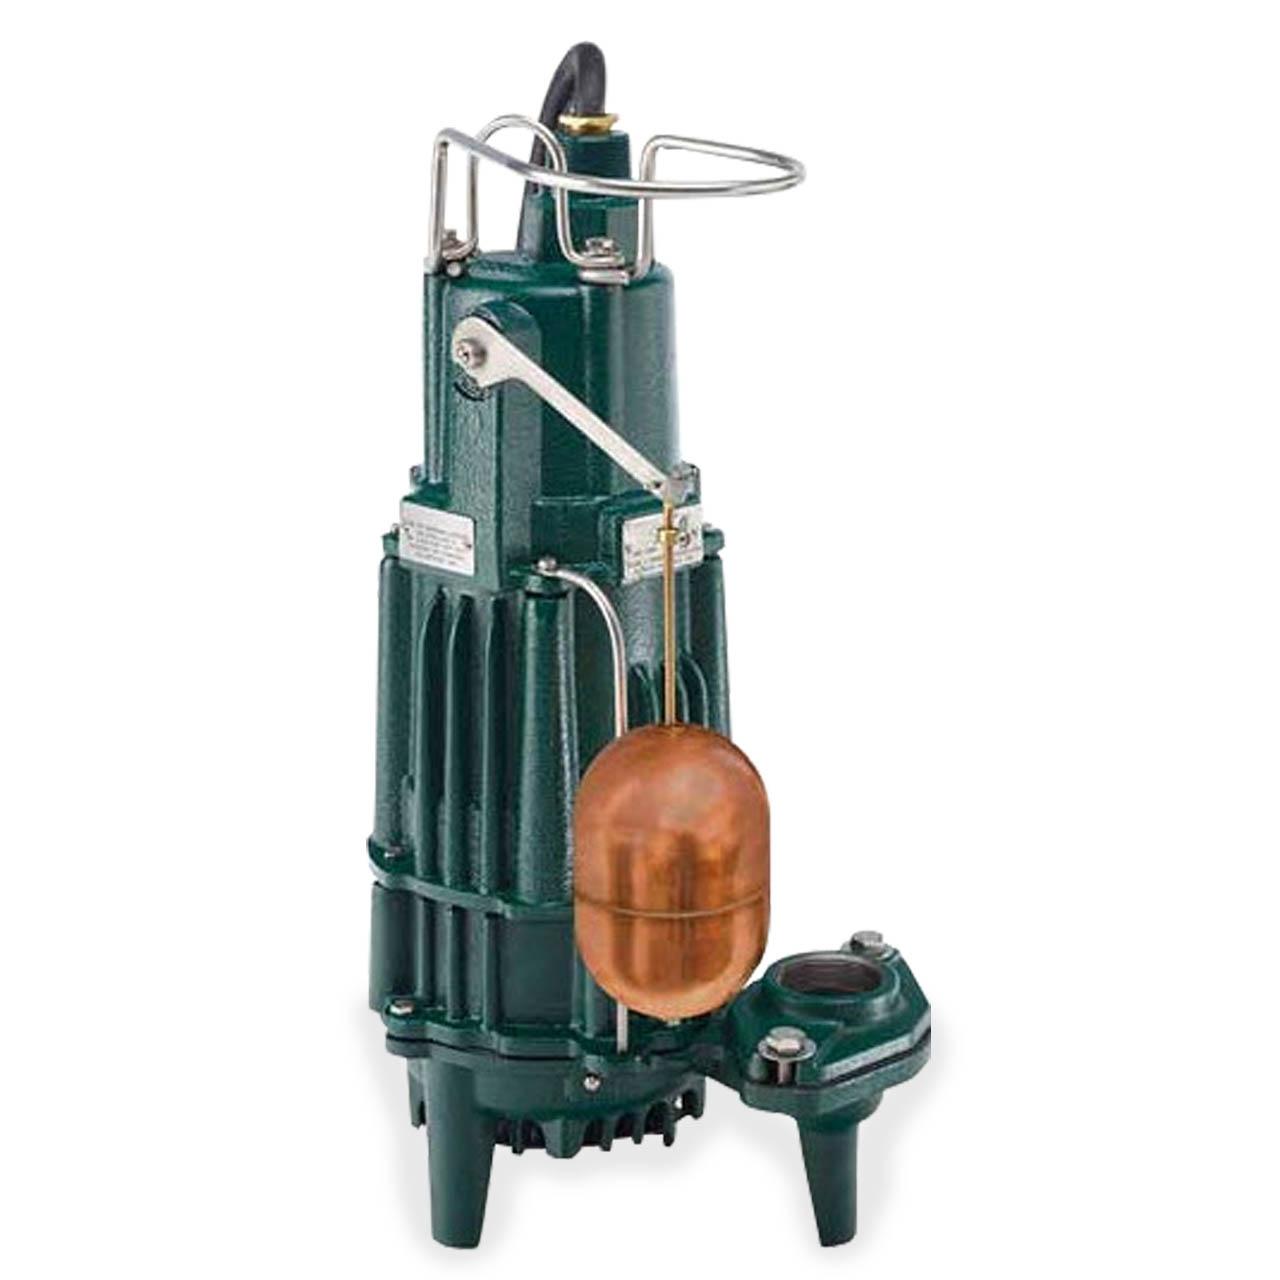 hight resolution of zoeller zoeller 161 0071 model mx161 explosion proof high head effluent pump 0 5 hp 115v 1ph 20 cord automatic zlr161 0071